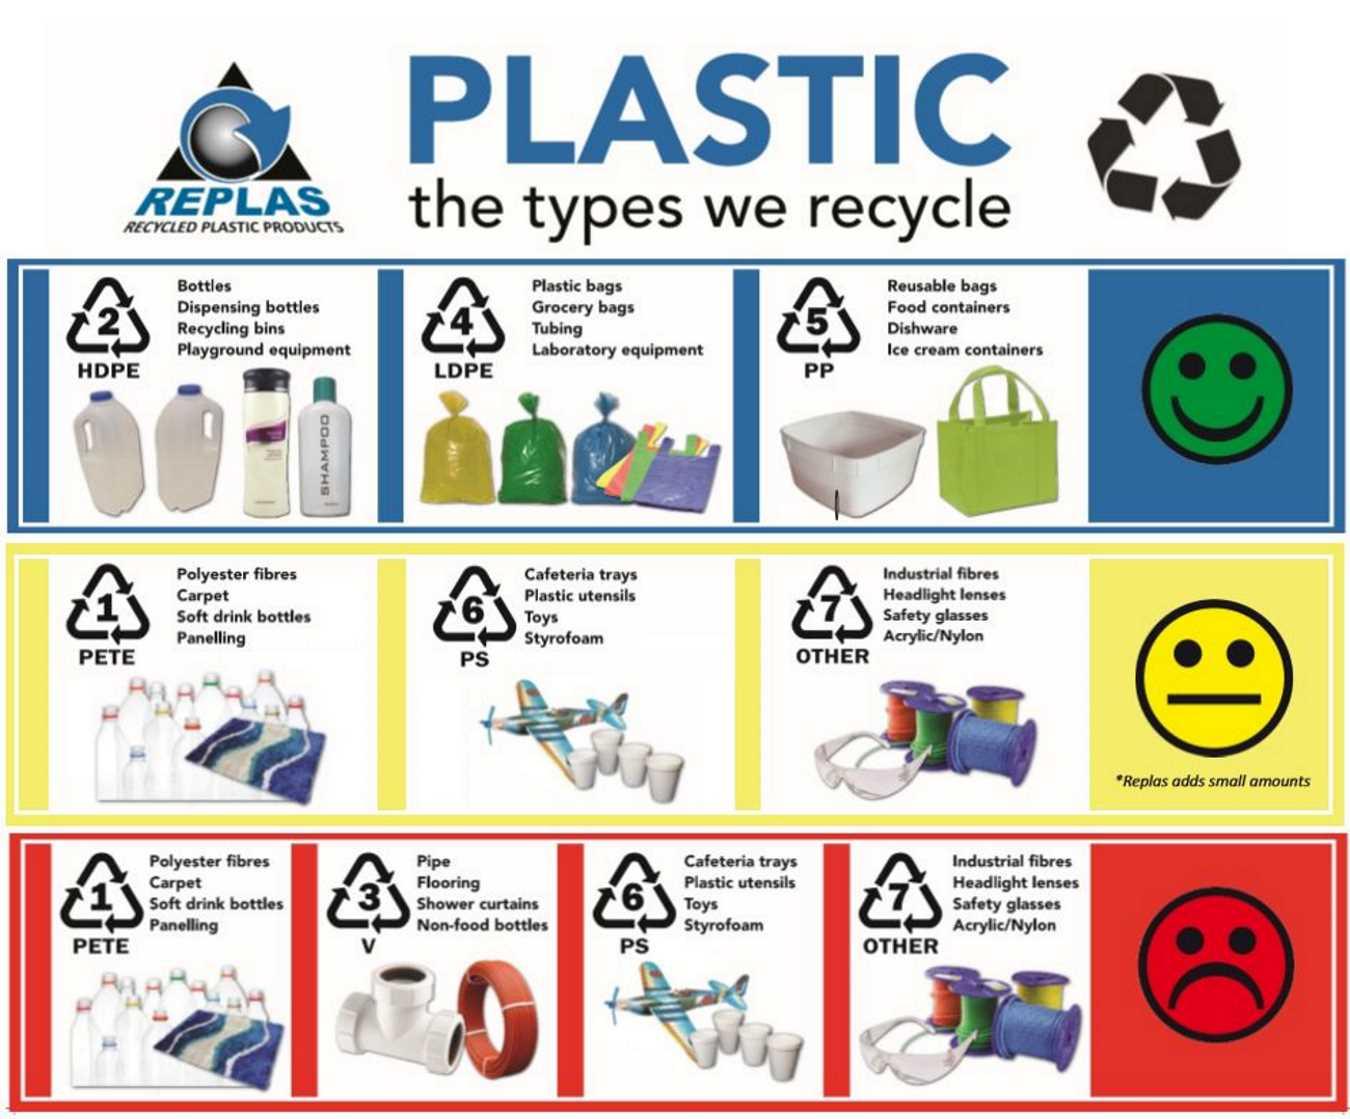 Could Plastics Be Eco Friendly